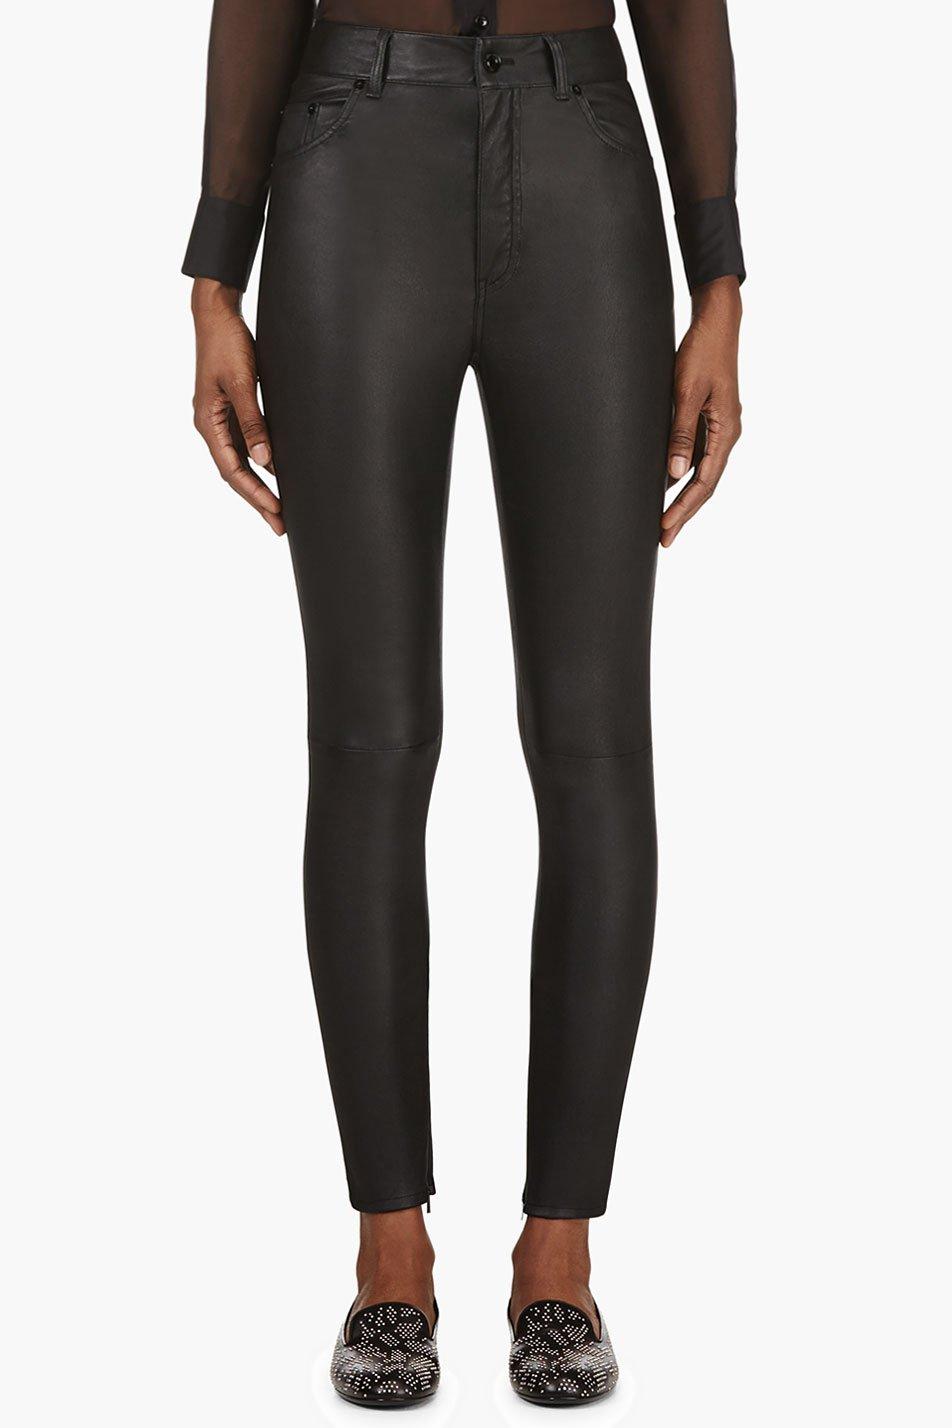 Saint laurent black leather skinny high waist trousers